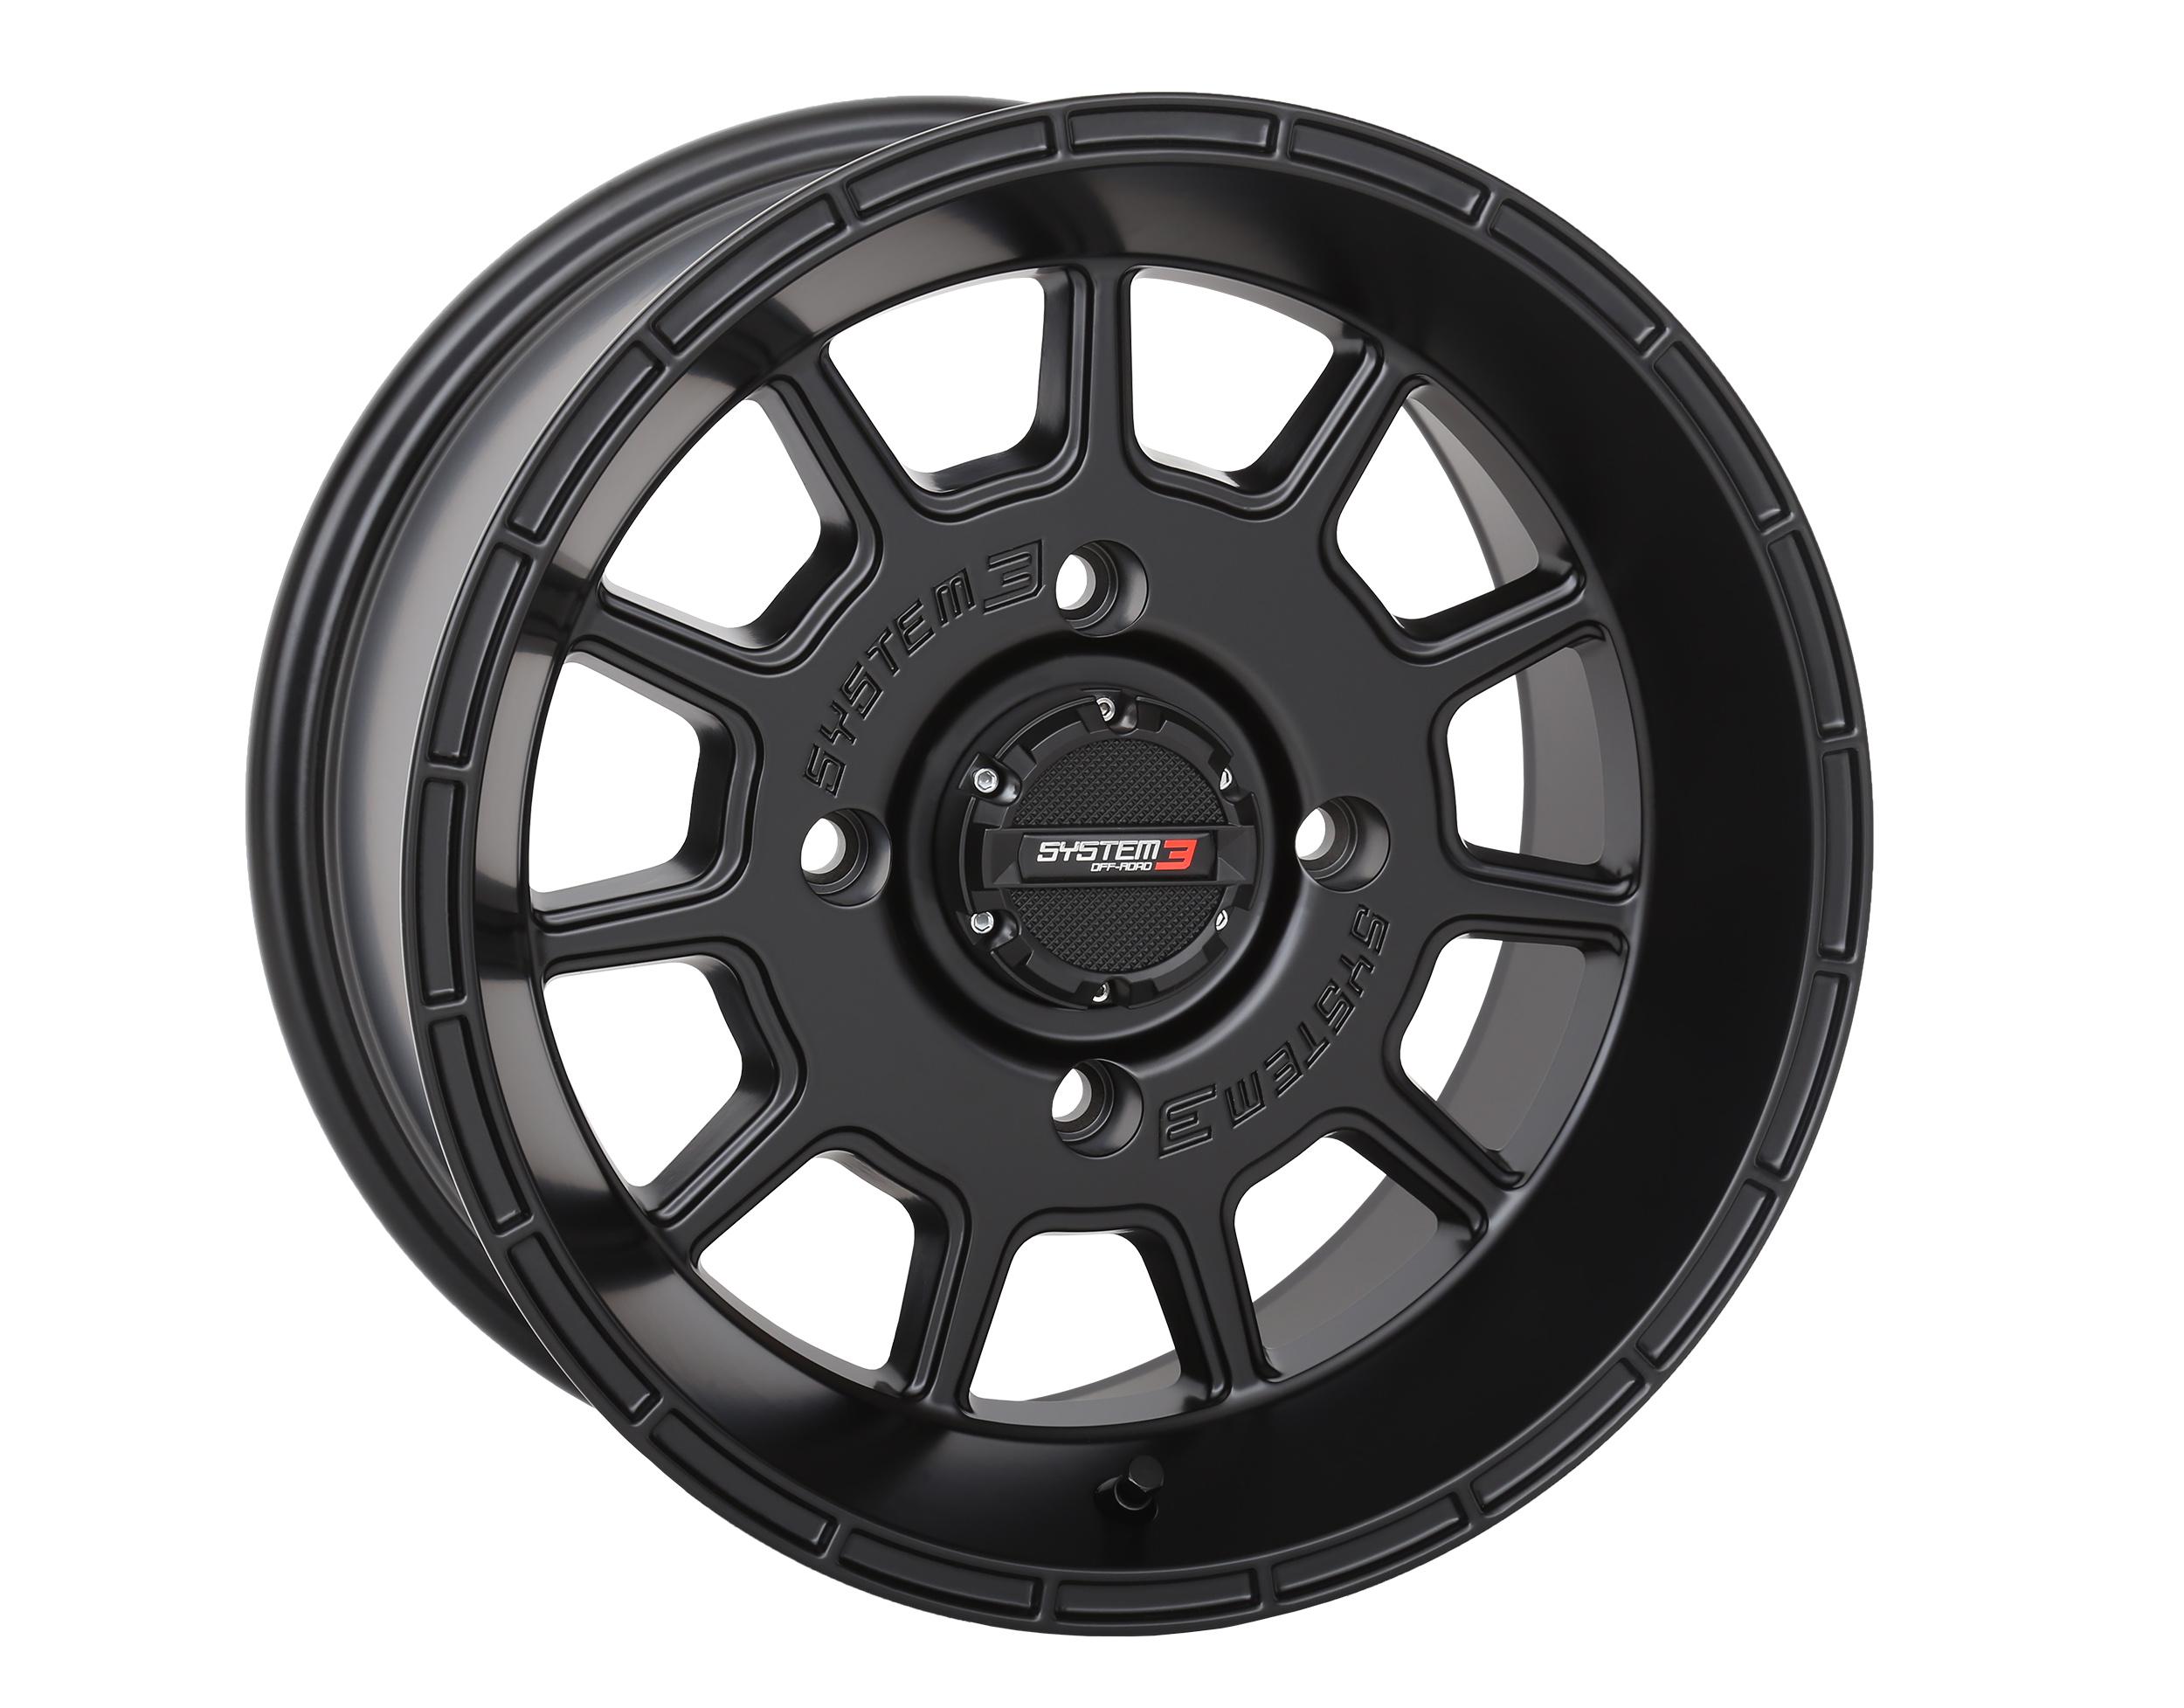 200227 System 3 ST-5 Wheel Black-main